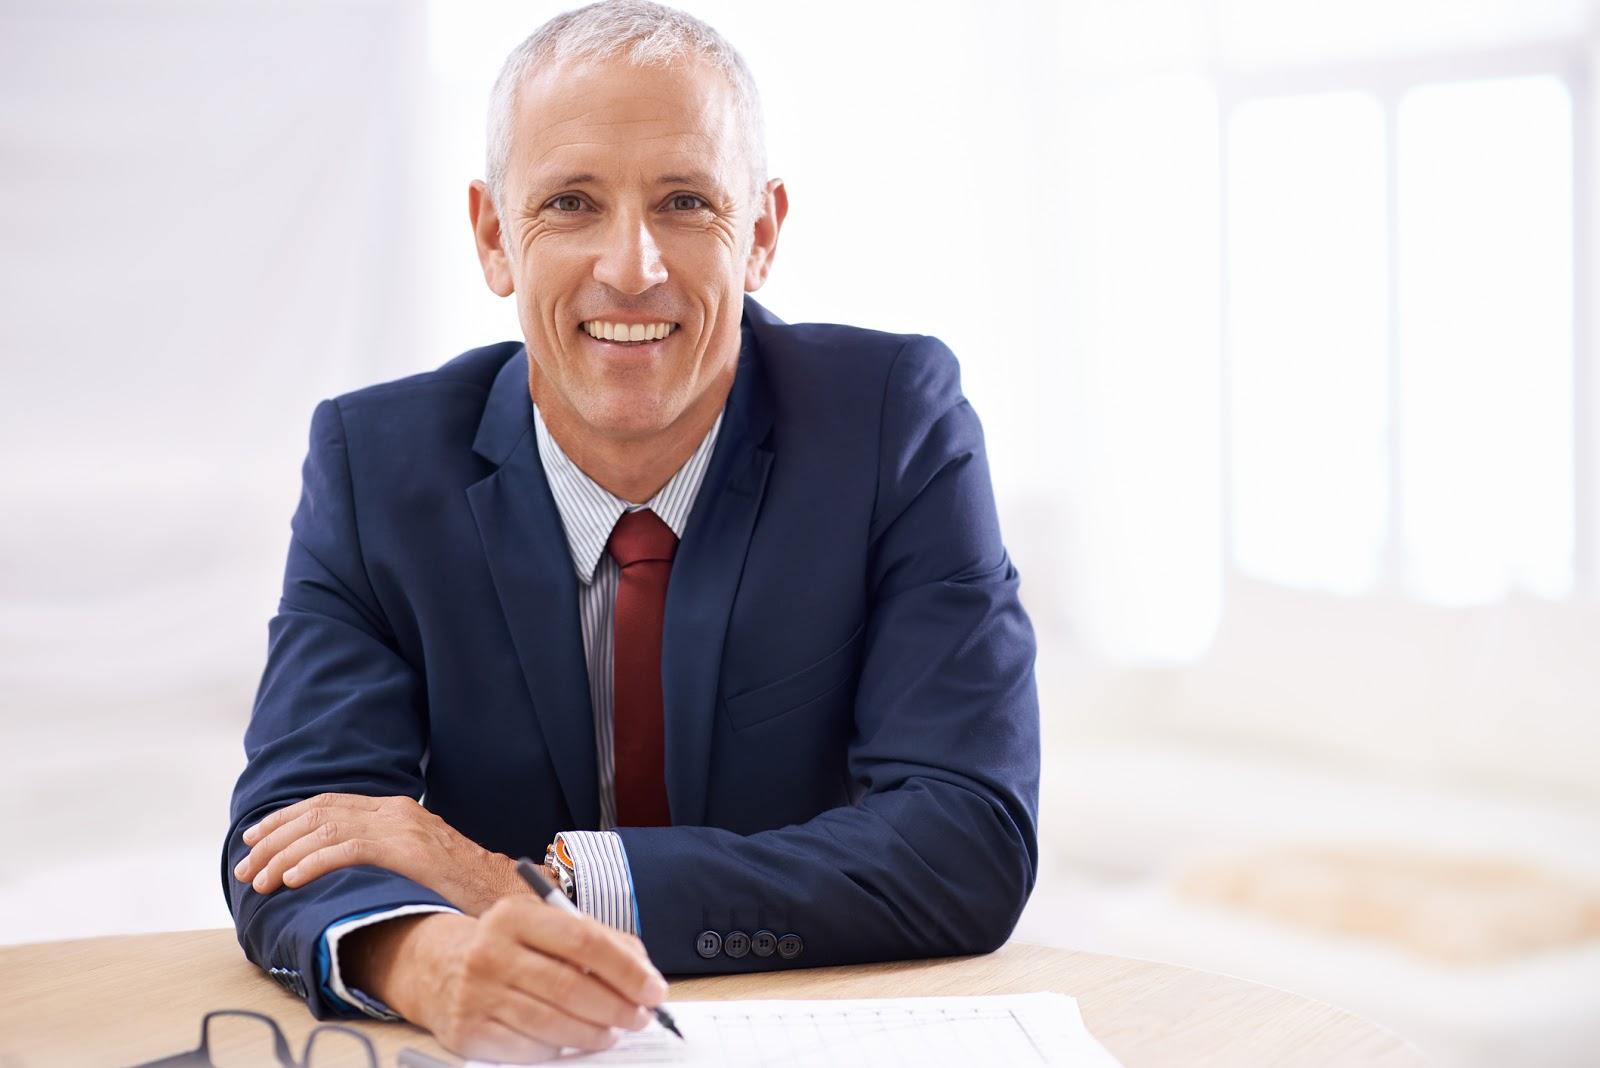 happy financial advisor at desk